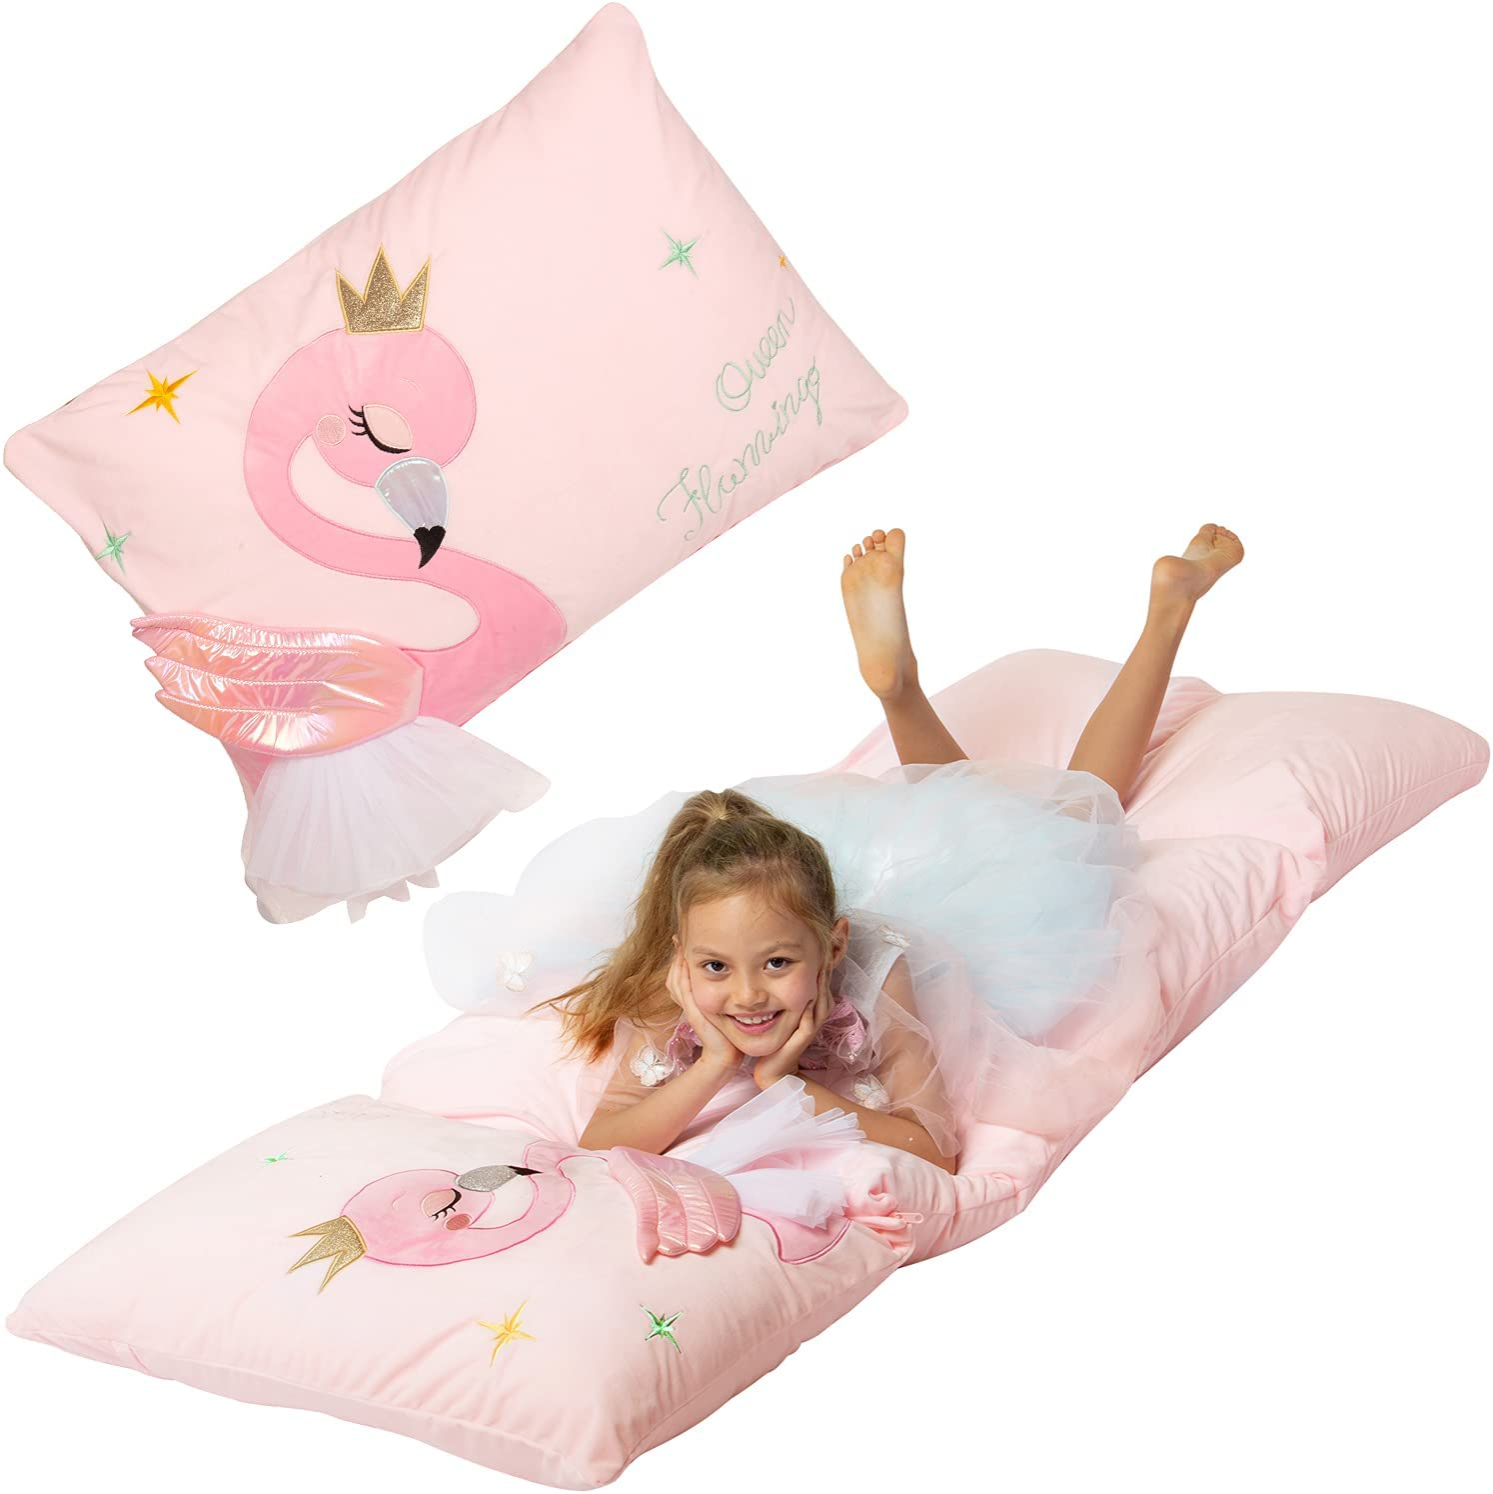 Yoweenton Flamingo Decorations Girls Room, Velvet Floor Pillow, Kids Lounge Chair for Bedroom, Kids Lounger for Teen Girl Room Décor, Cover ONLY